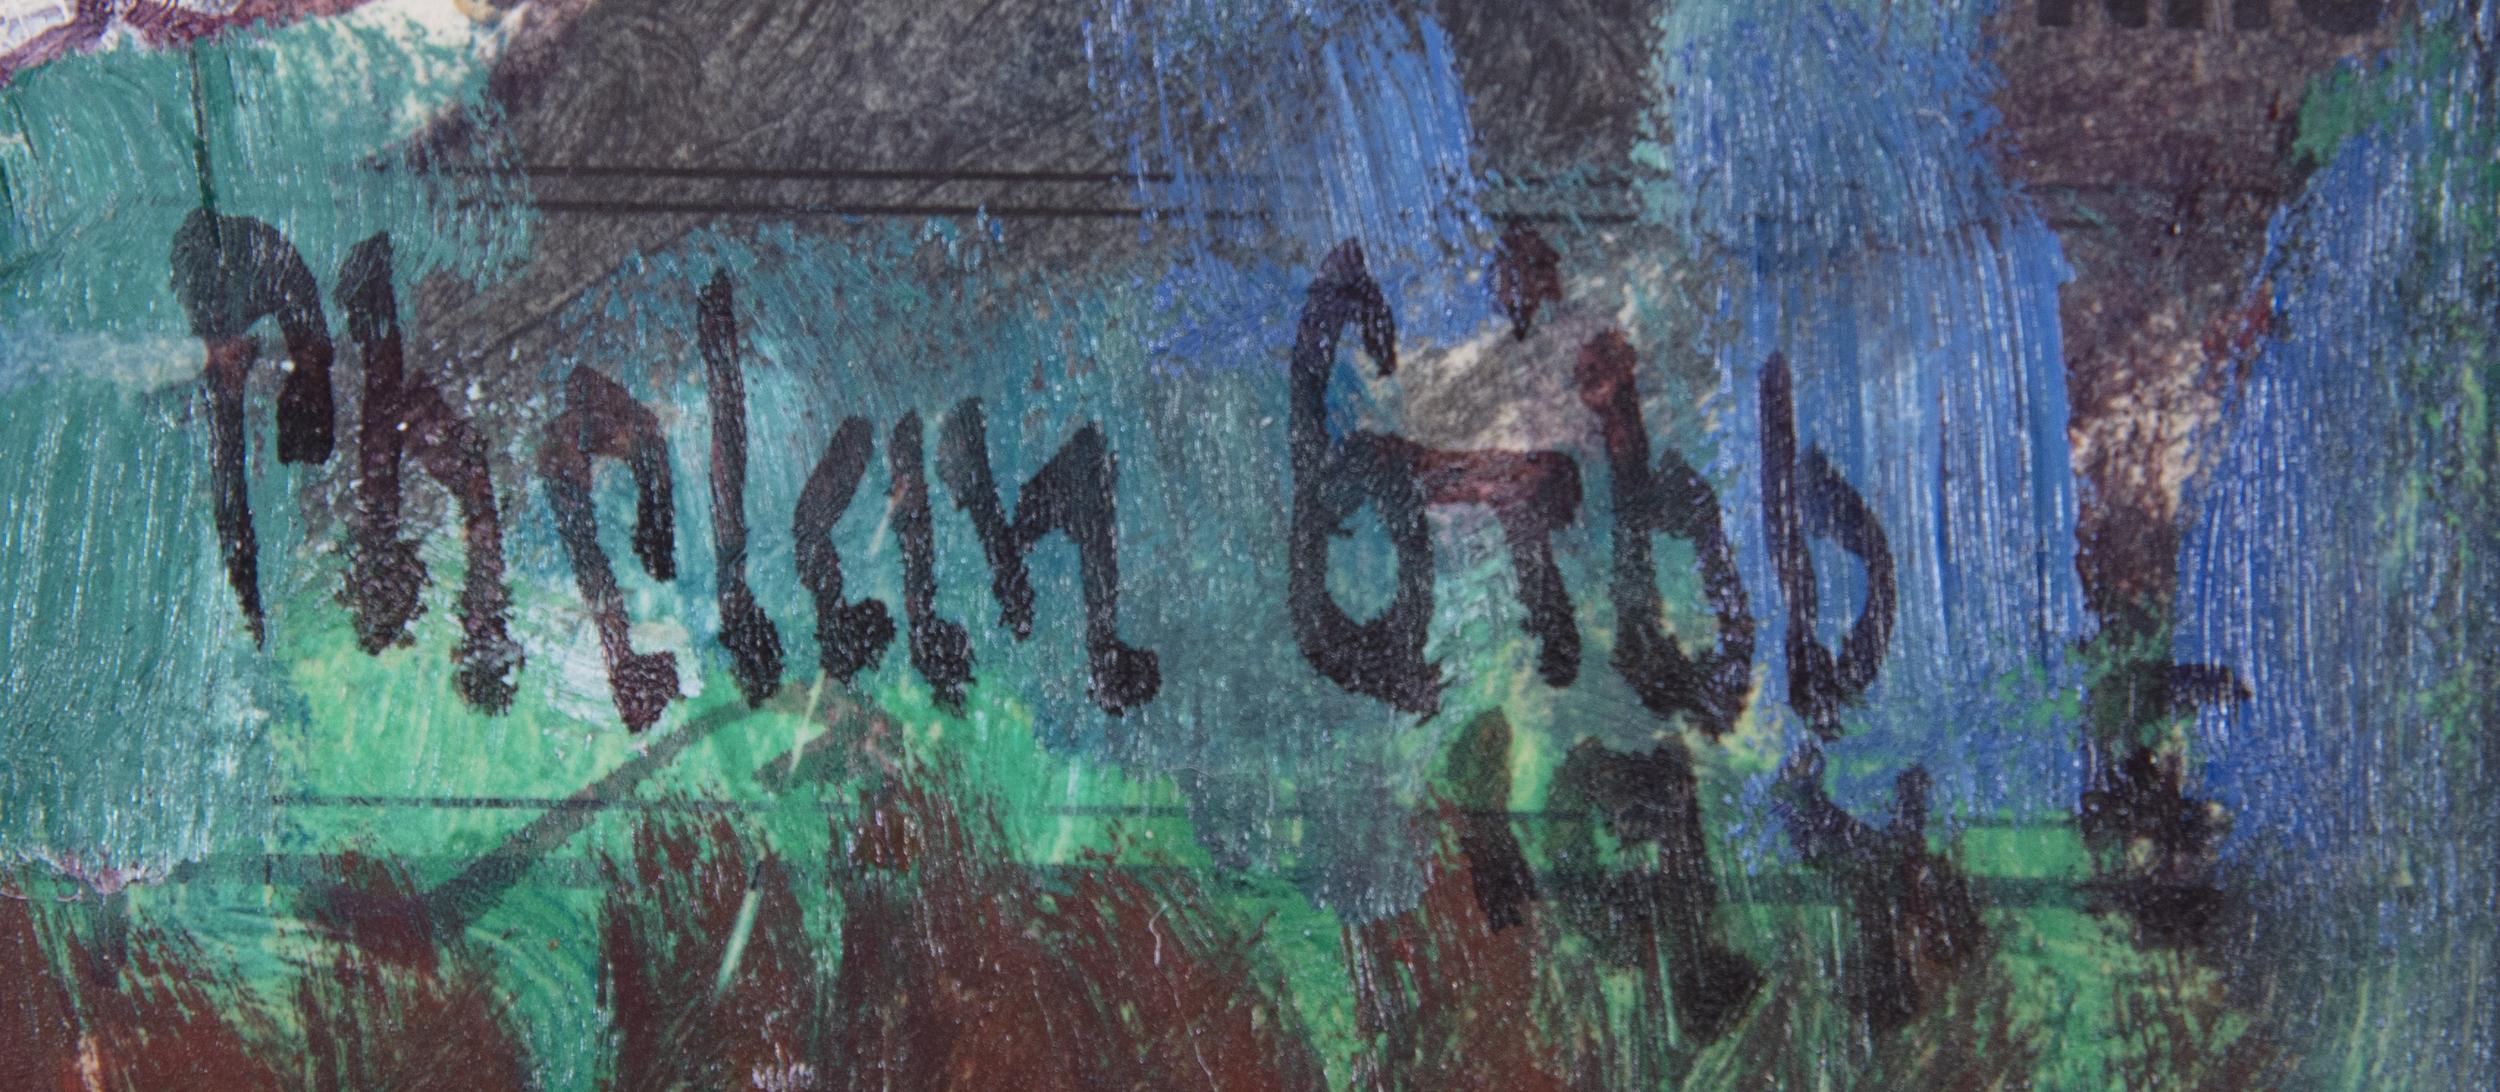 Lot 53 - Harry Phelan Gibb (1870-1948)Six Horses in a Landscape (1945)Oil on board, 24 x 28cm (9½ x 11)Signed